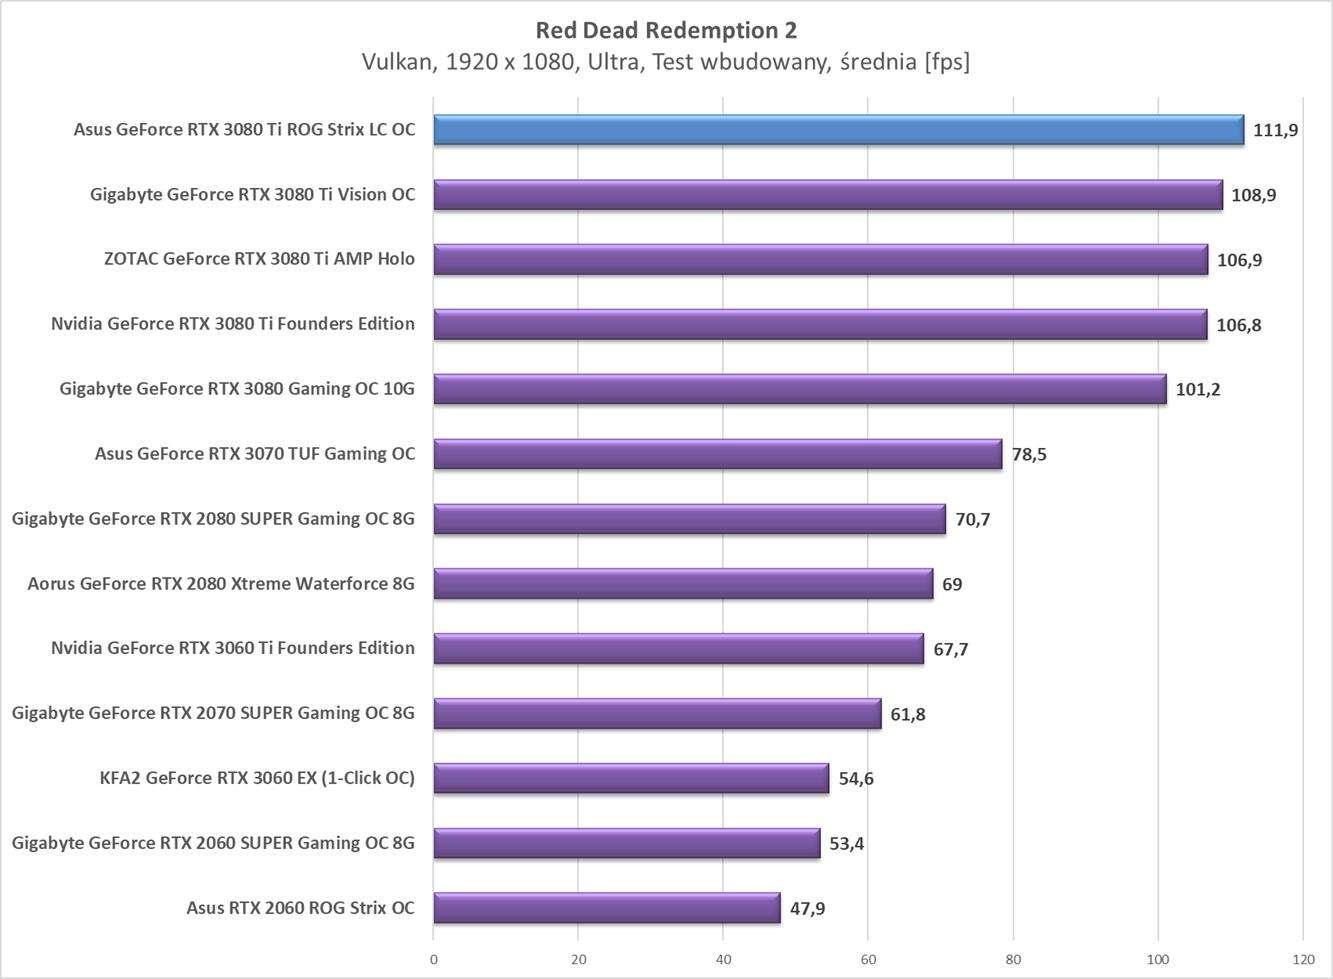 Test Asus GeForce RTX 3080 Ti ROG Strix LC OC